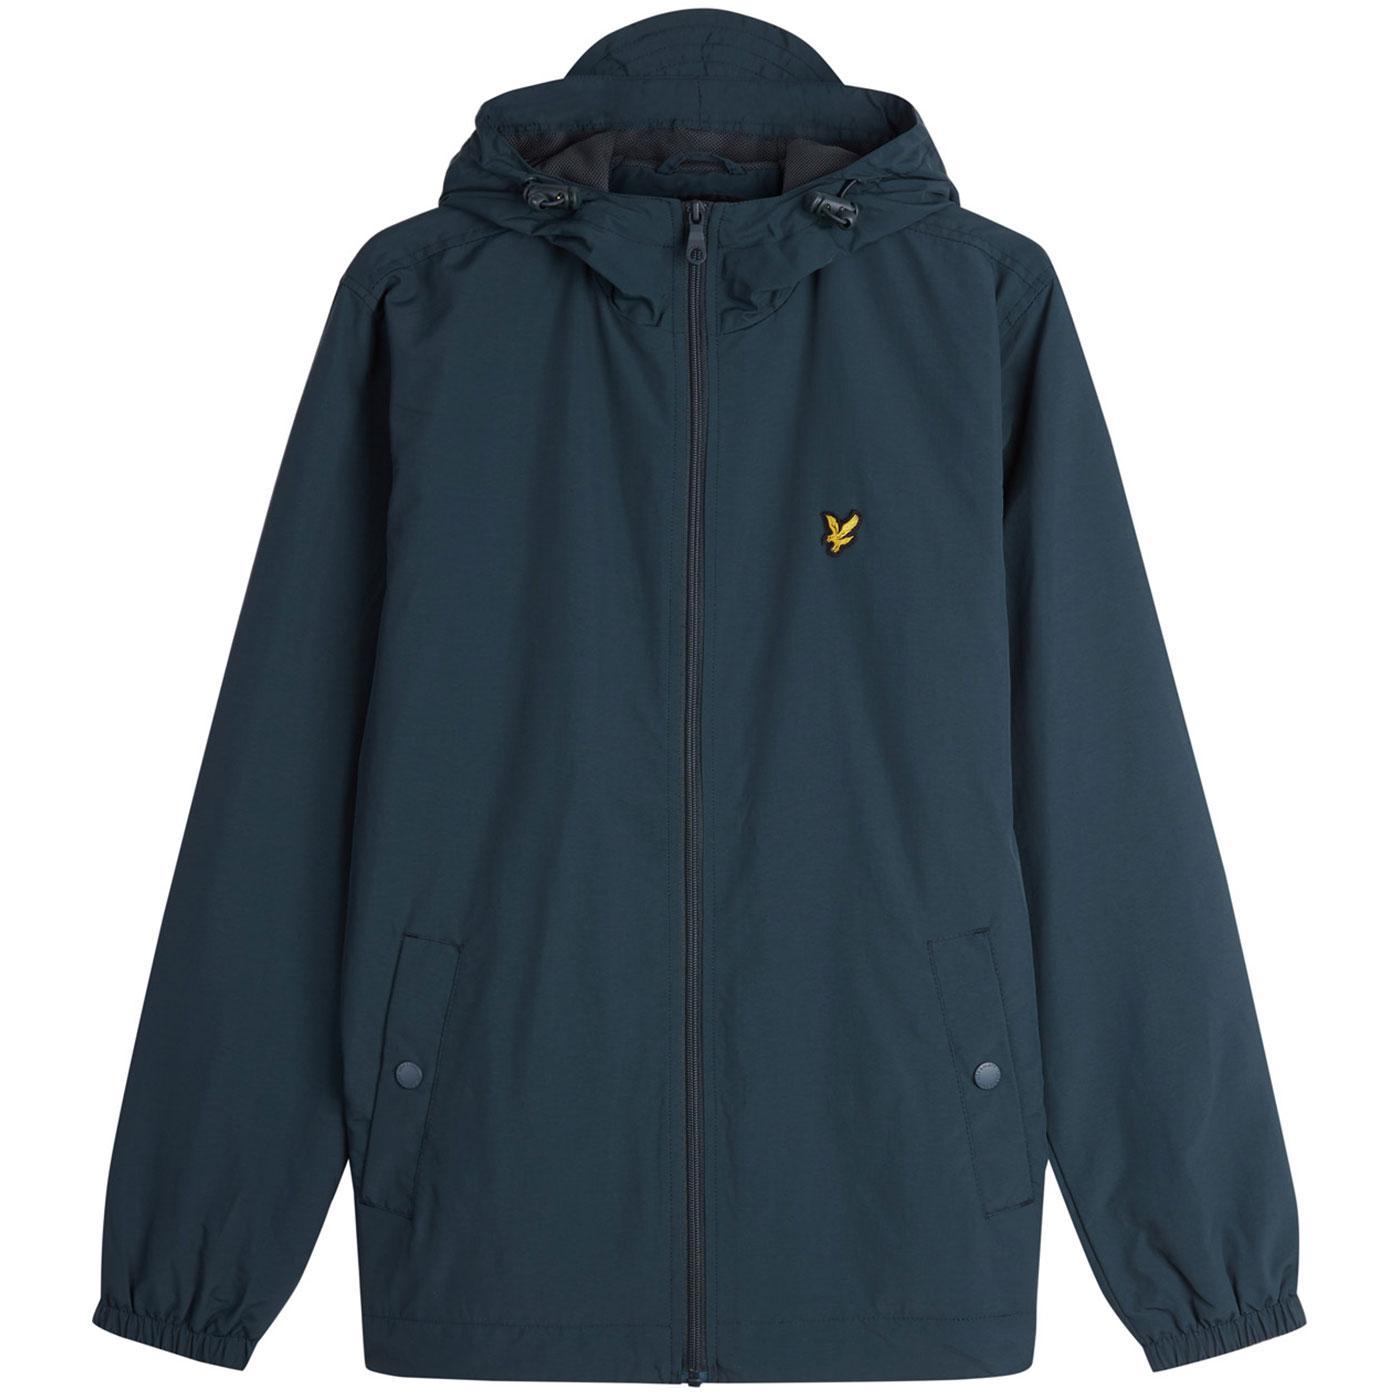 LYLE & SCOTT Retro Zip Through Hooded Jacket (JG)